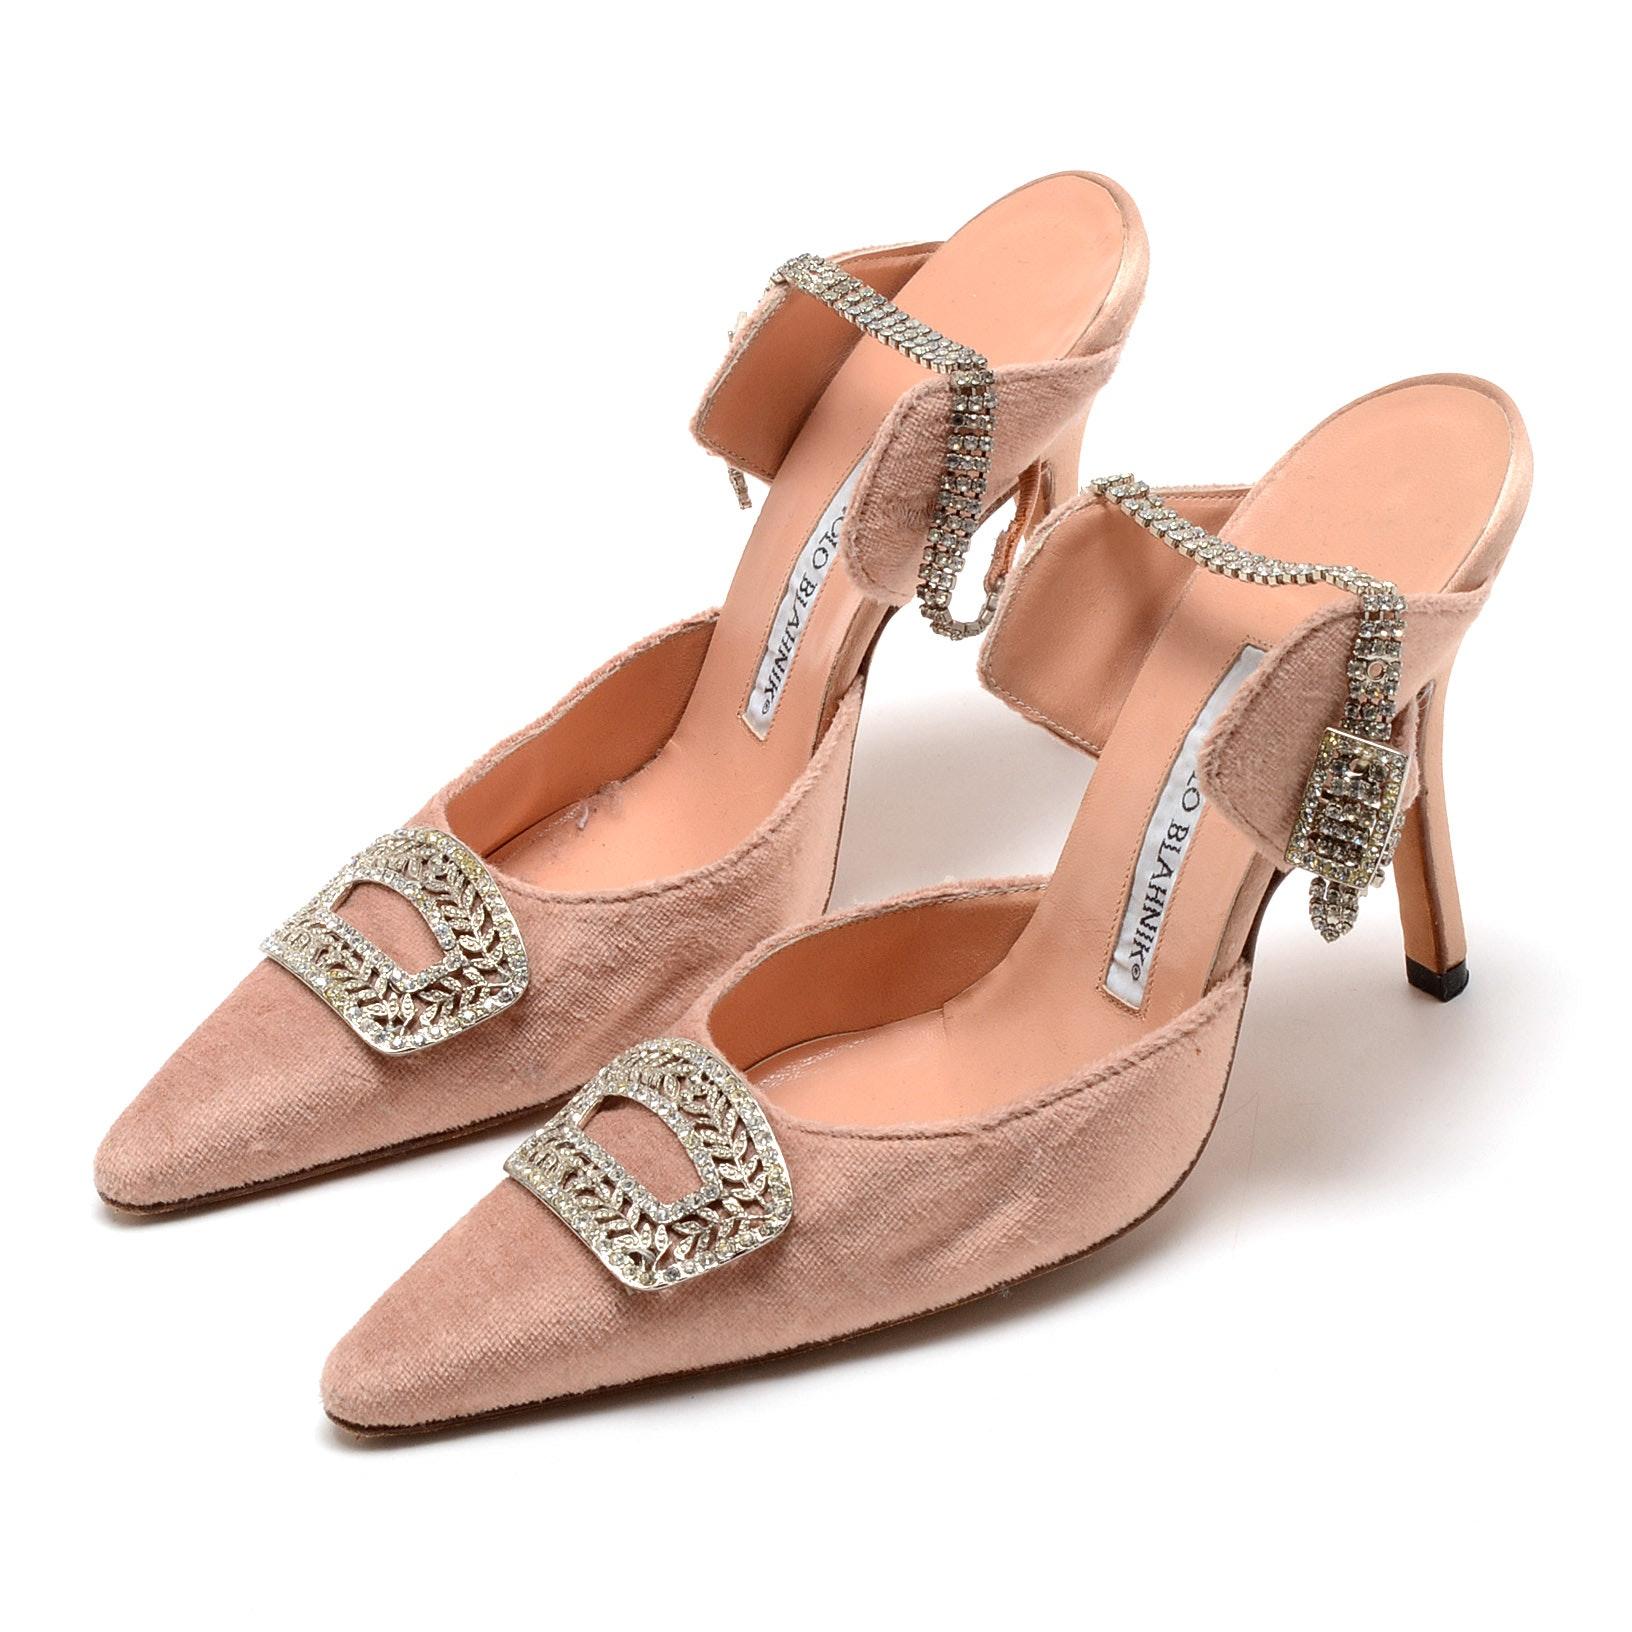 Manolo Blahnik Blush Velvet Satin Leather Ankle Strap Dress Pumps Embellished with Crystal Rhinestones